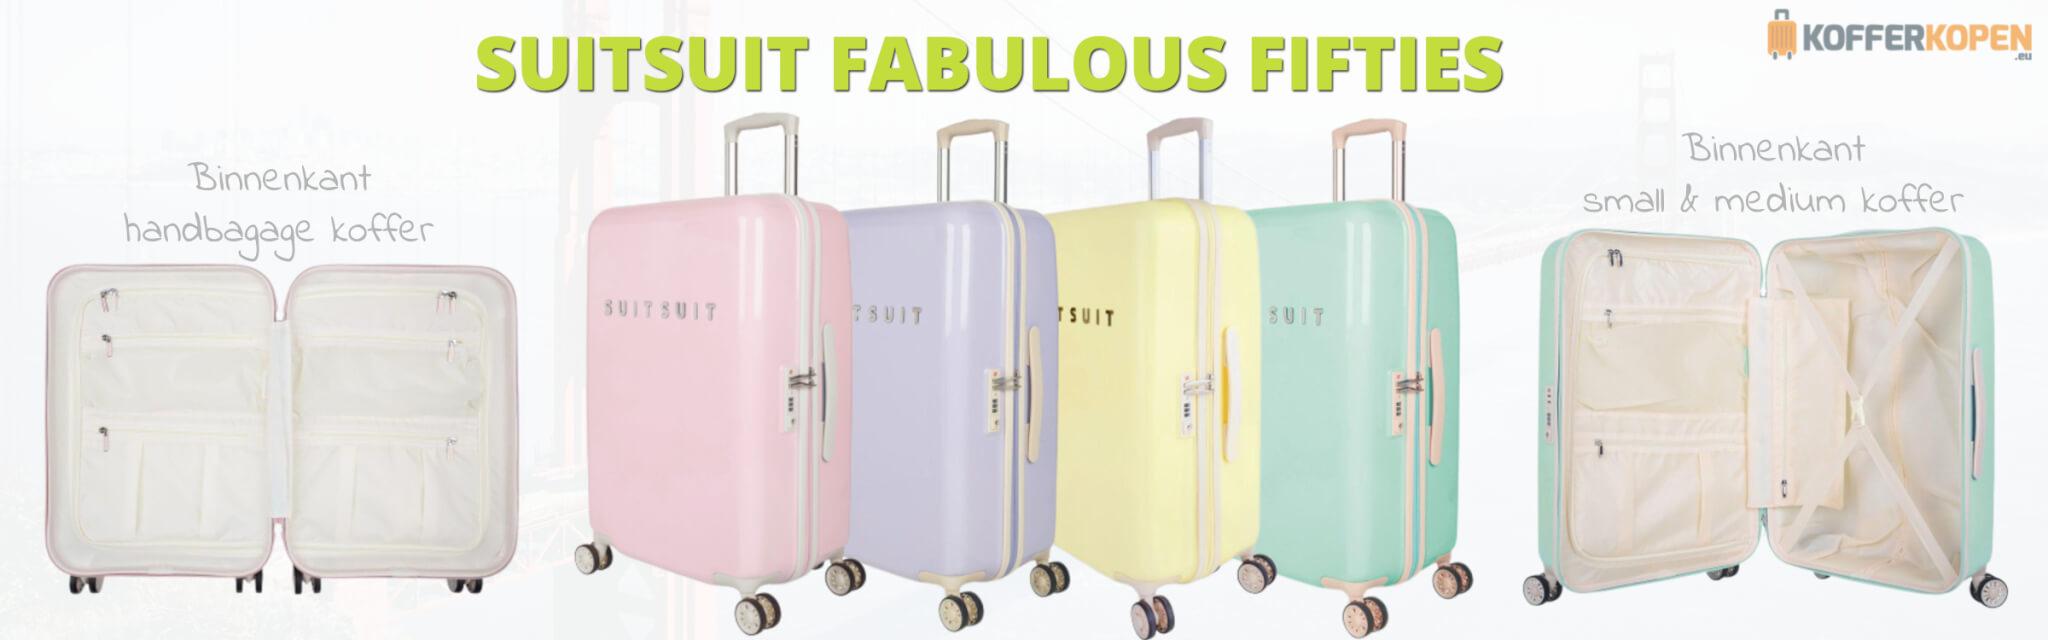 suitsuit fabulous fifties koffers kleuren binnenkant